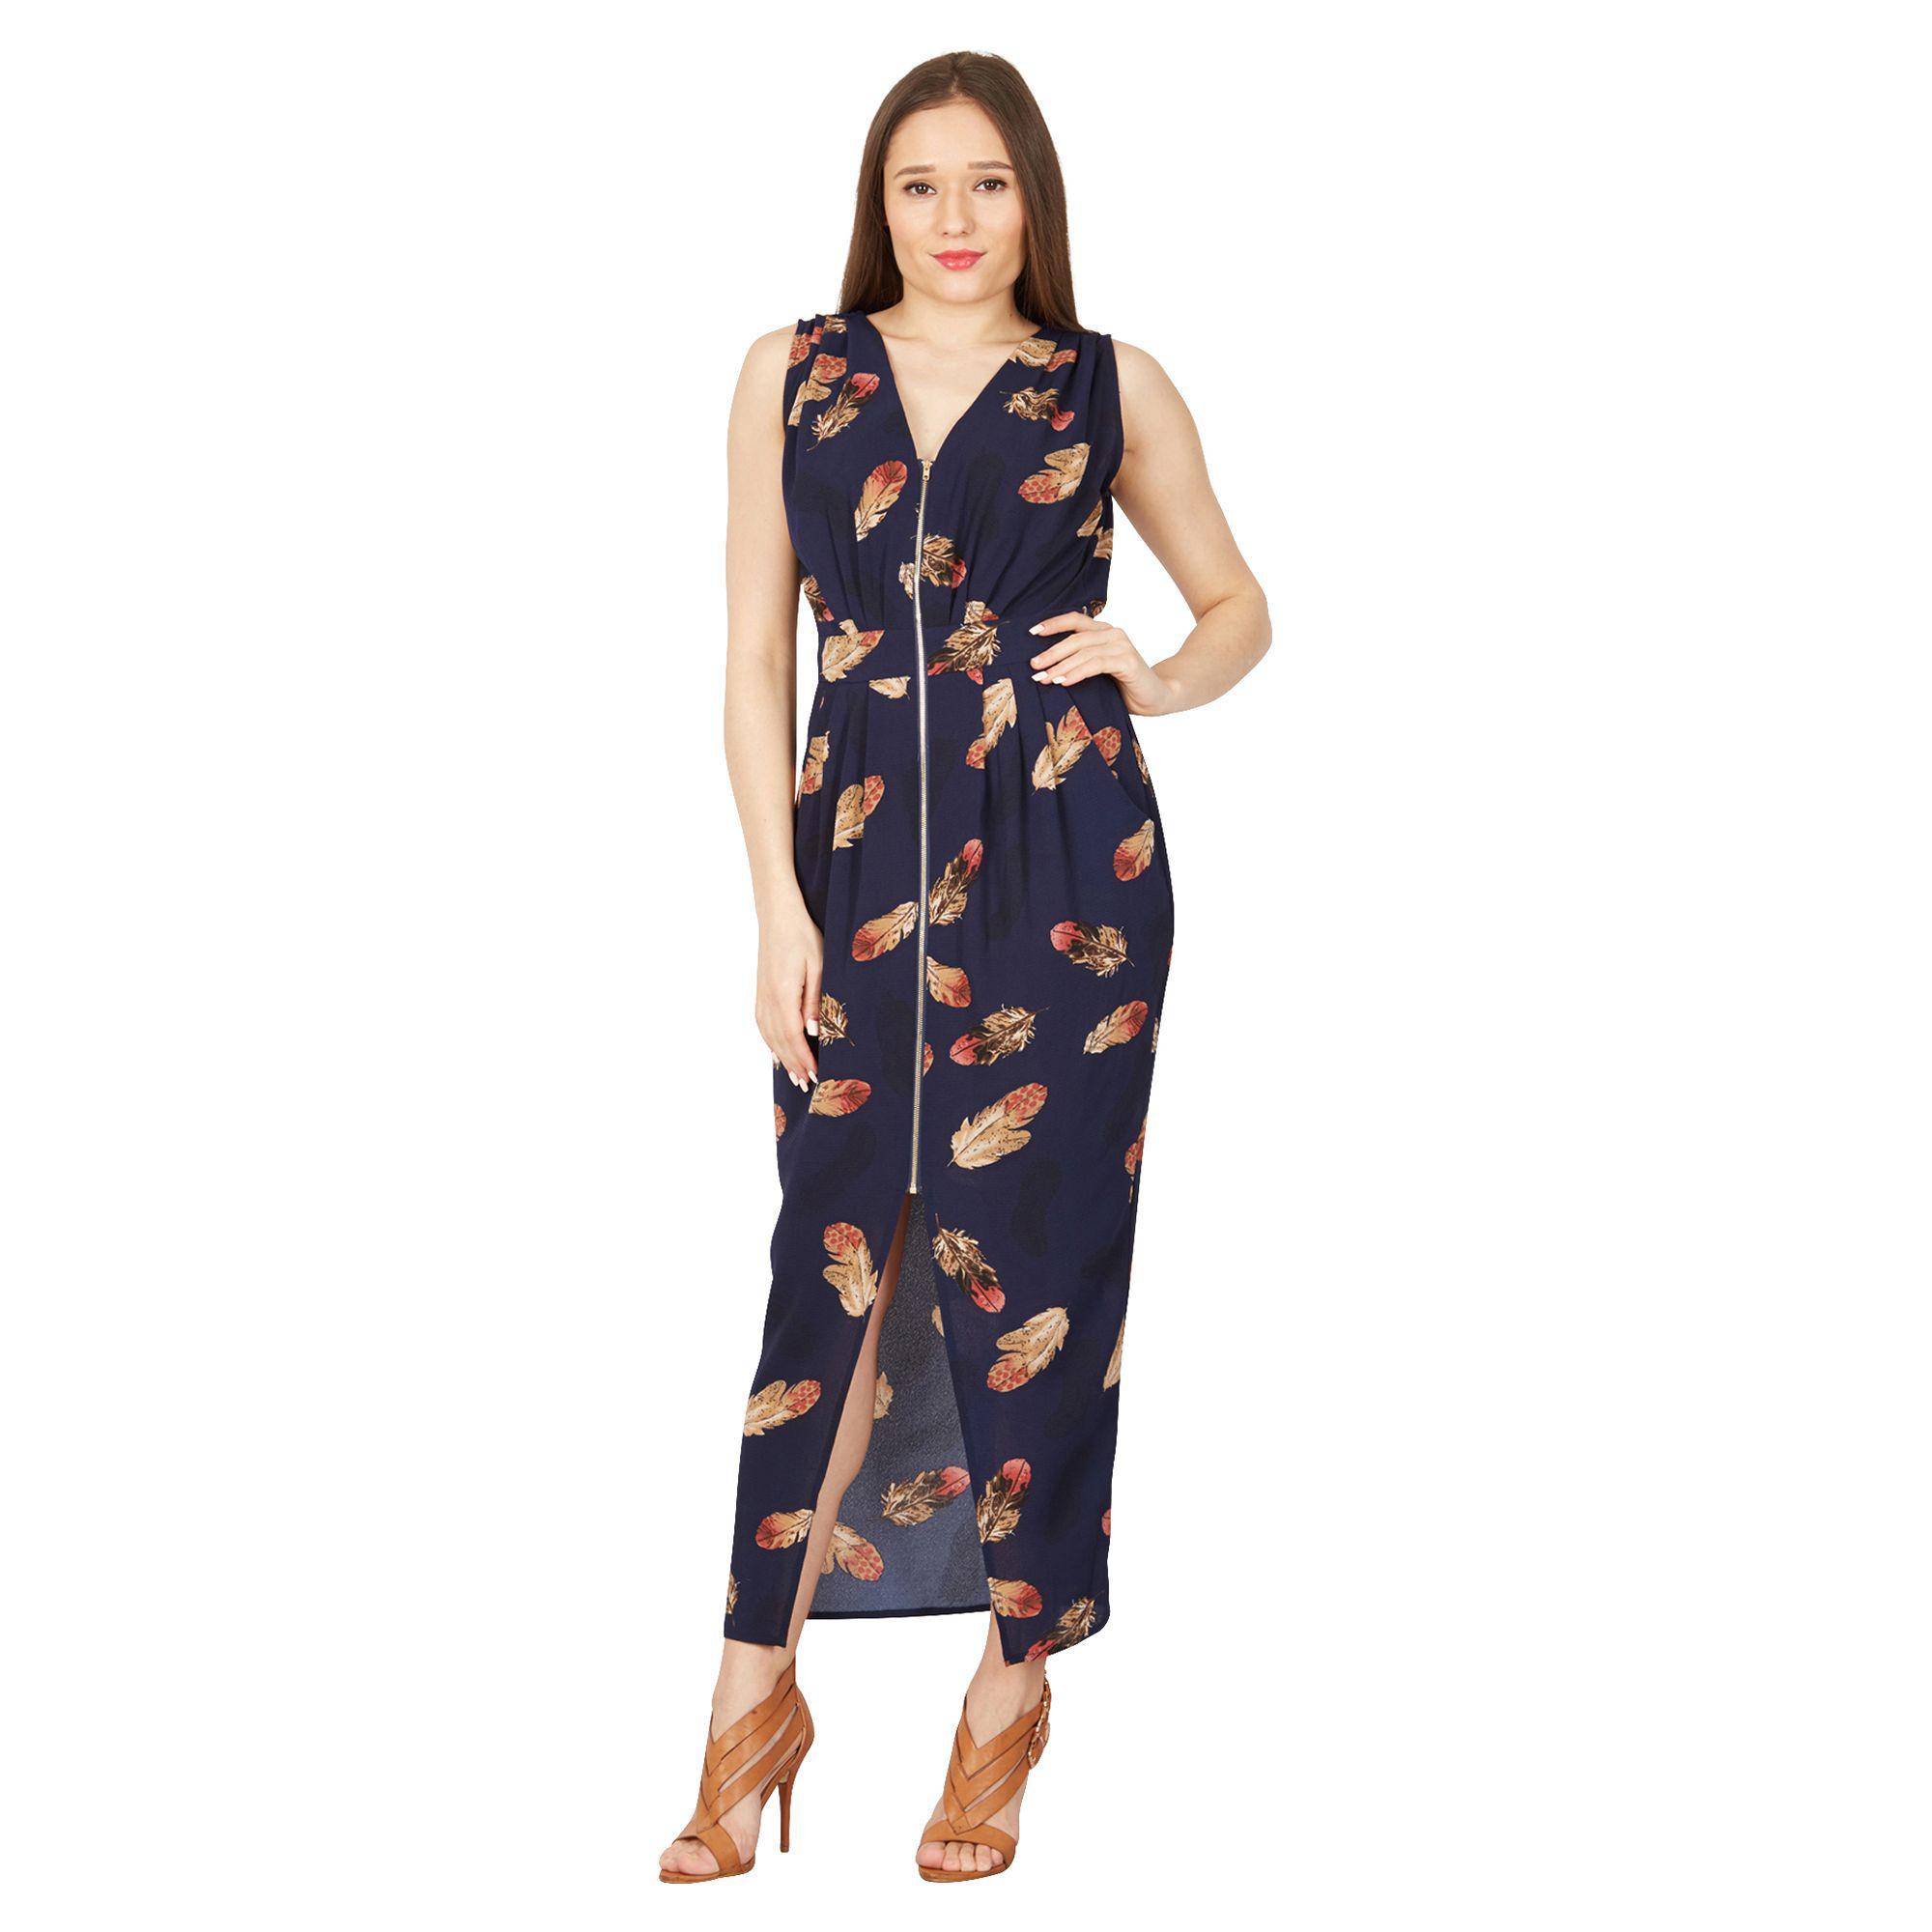 d928b5de4e27 Izabel London Navy Feather Print Maxi Dress in Blue - Lyst